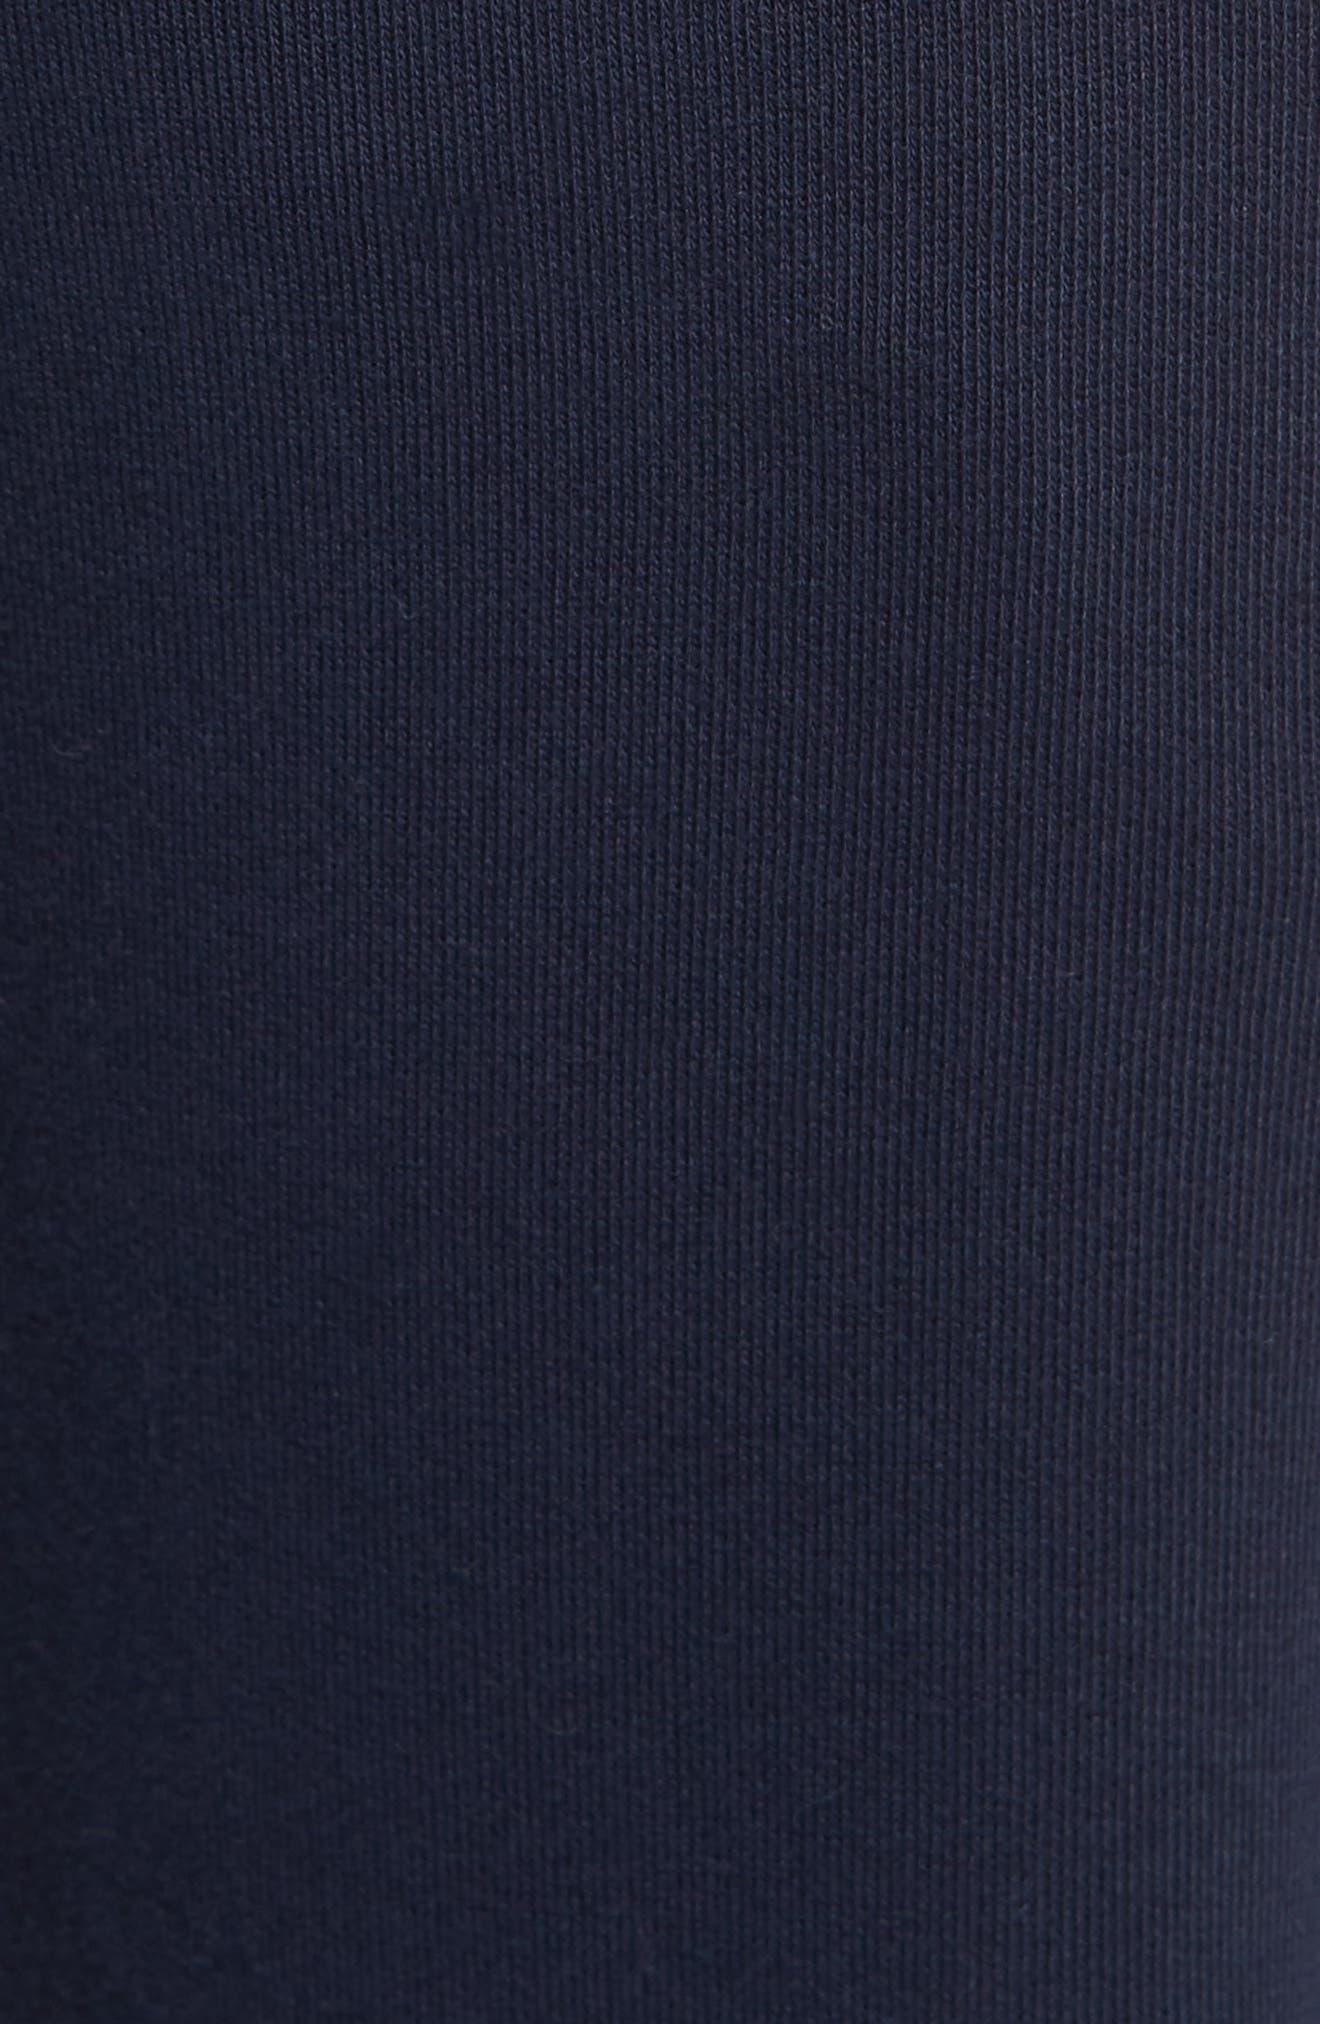 Horseshoe Sweatpants,                             Alternate thumbnail 5, color,                             Navy